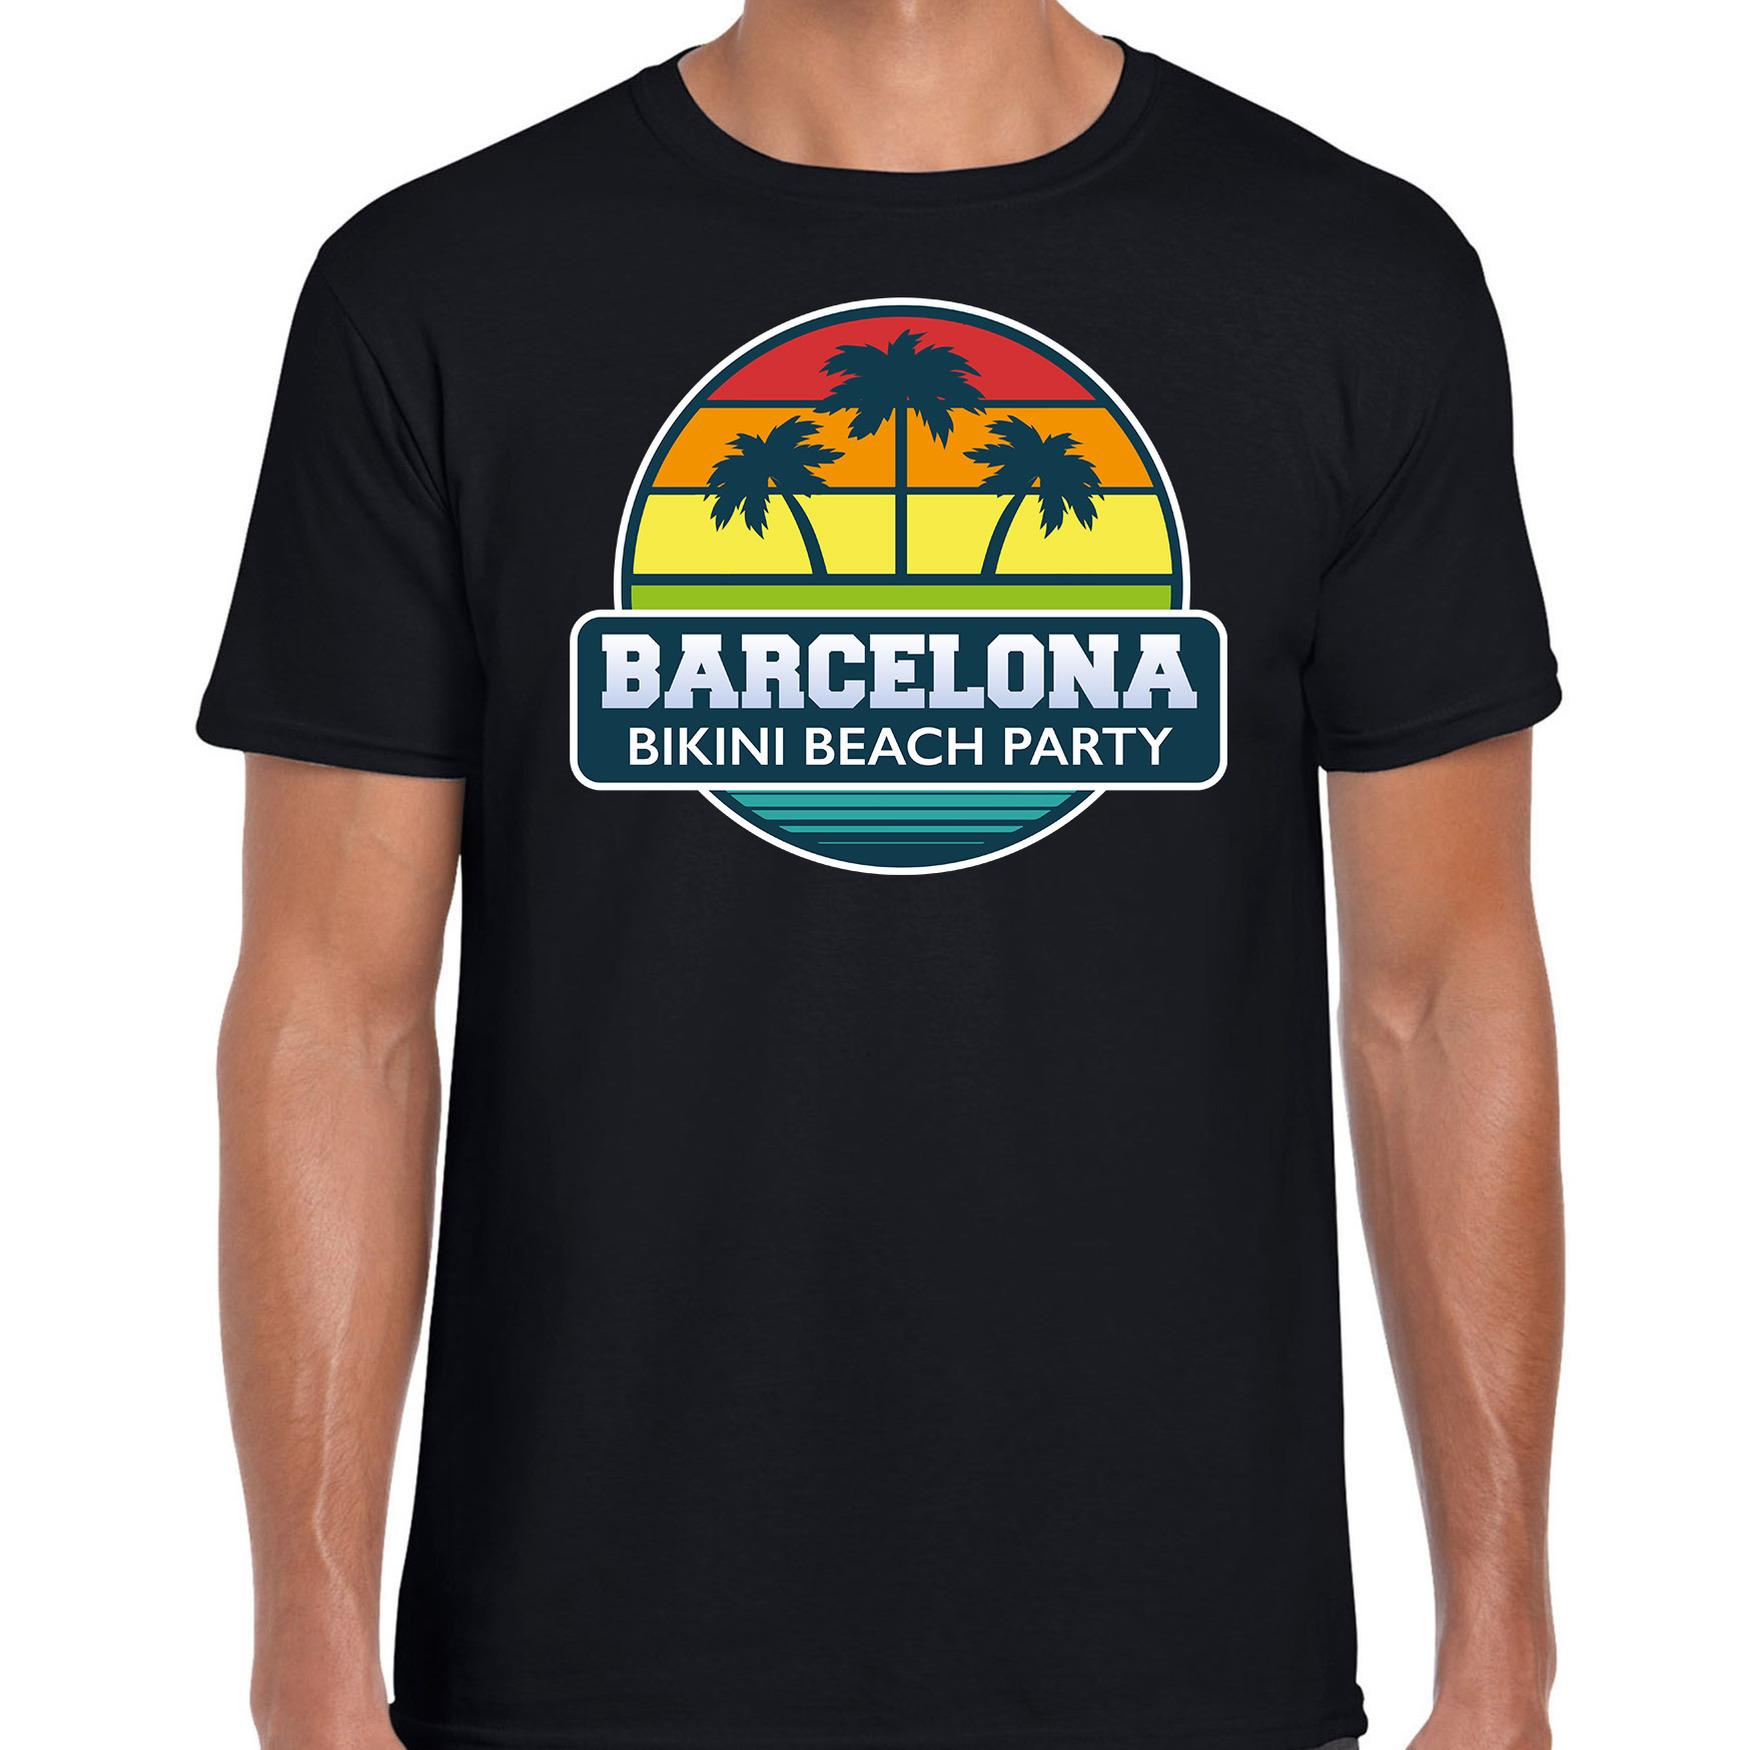 Barcelona zomer t-shirt / shirt Barcelona bikini beach party zwart voor heren